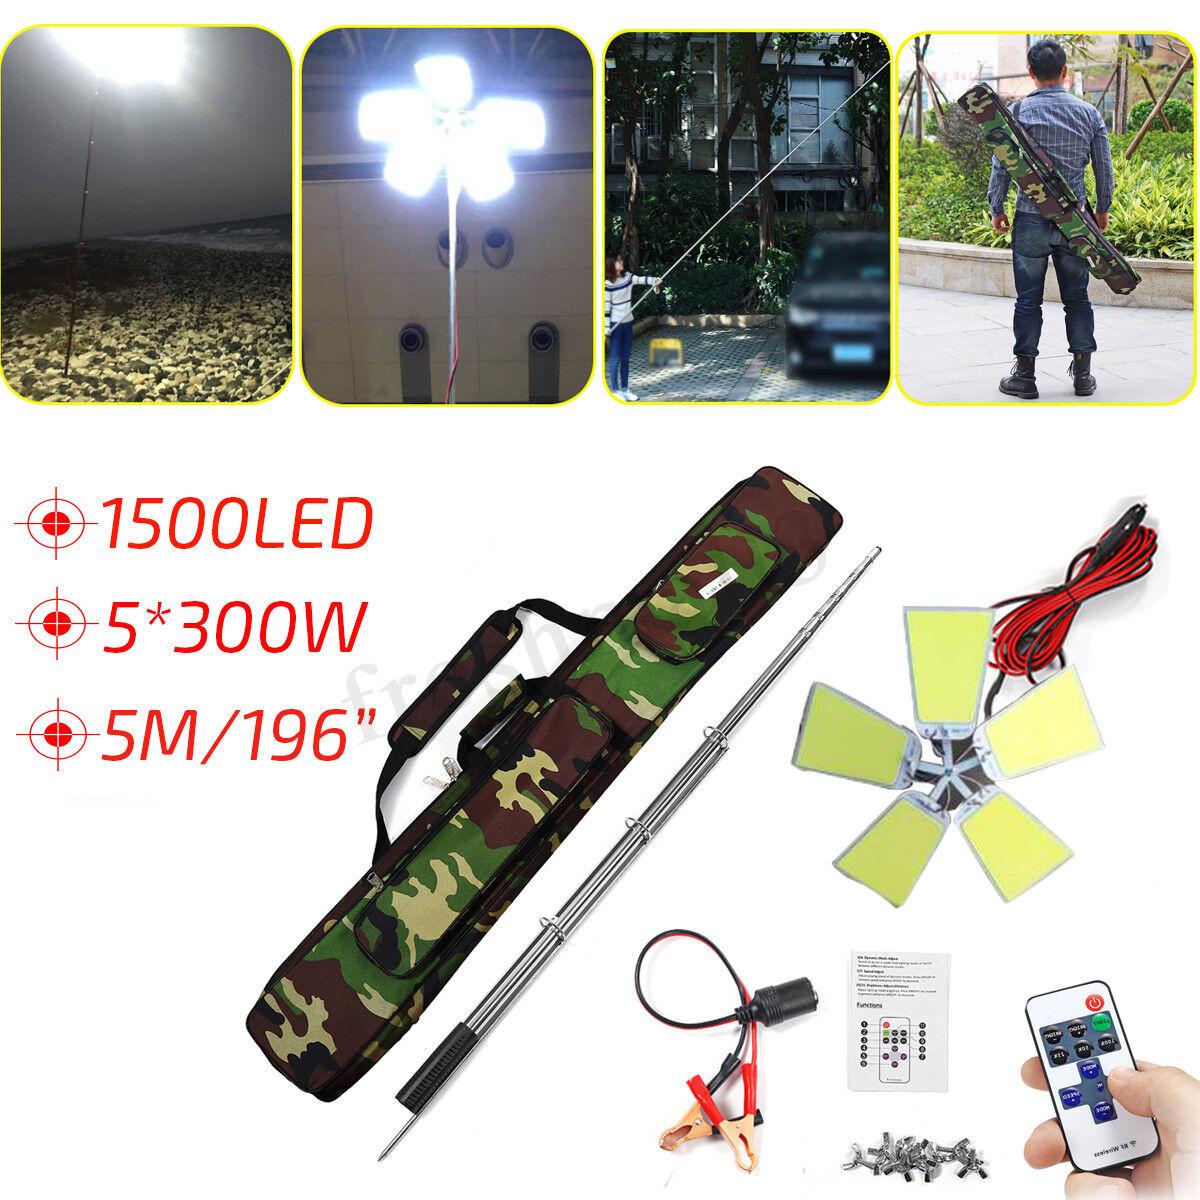 1500W 1500 LED Telescopic Fishing Rod Car Repair Lantern Camping Light Lamp +Bag